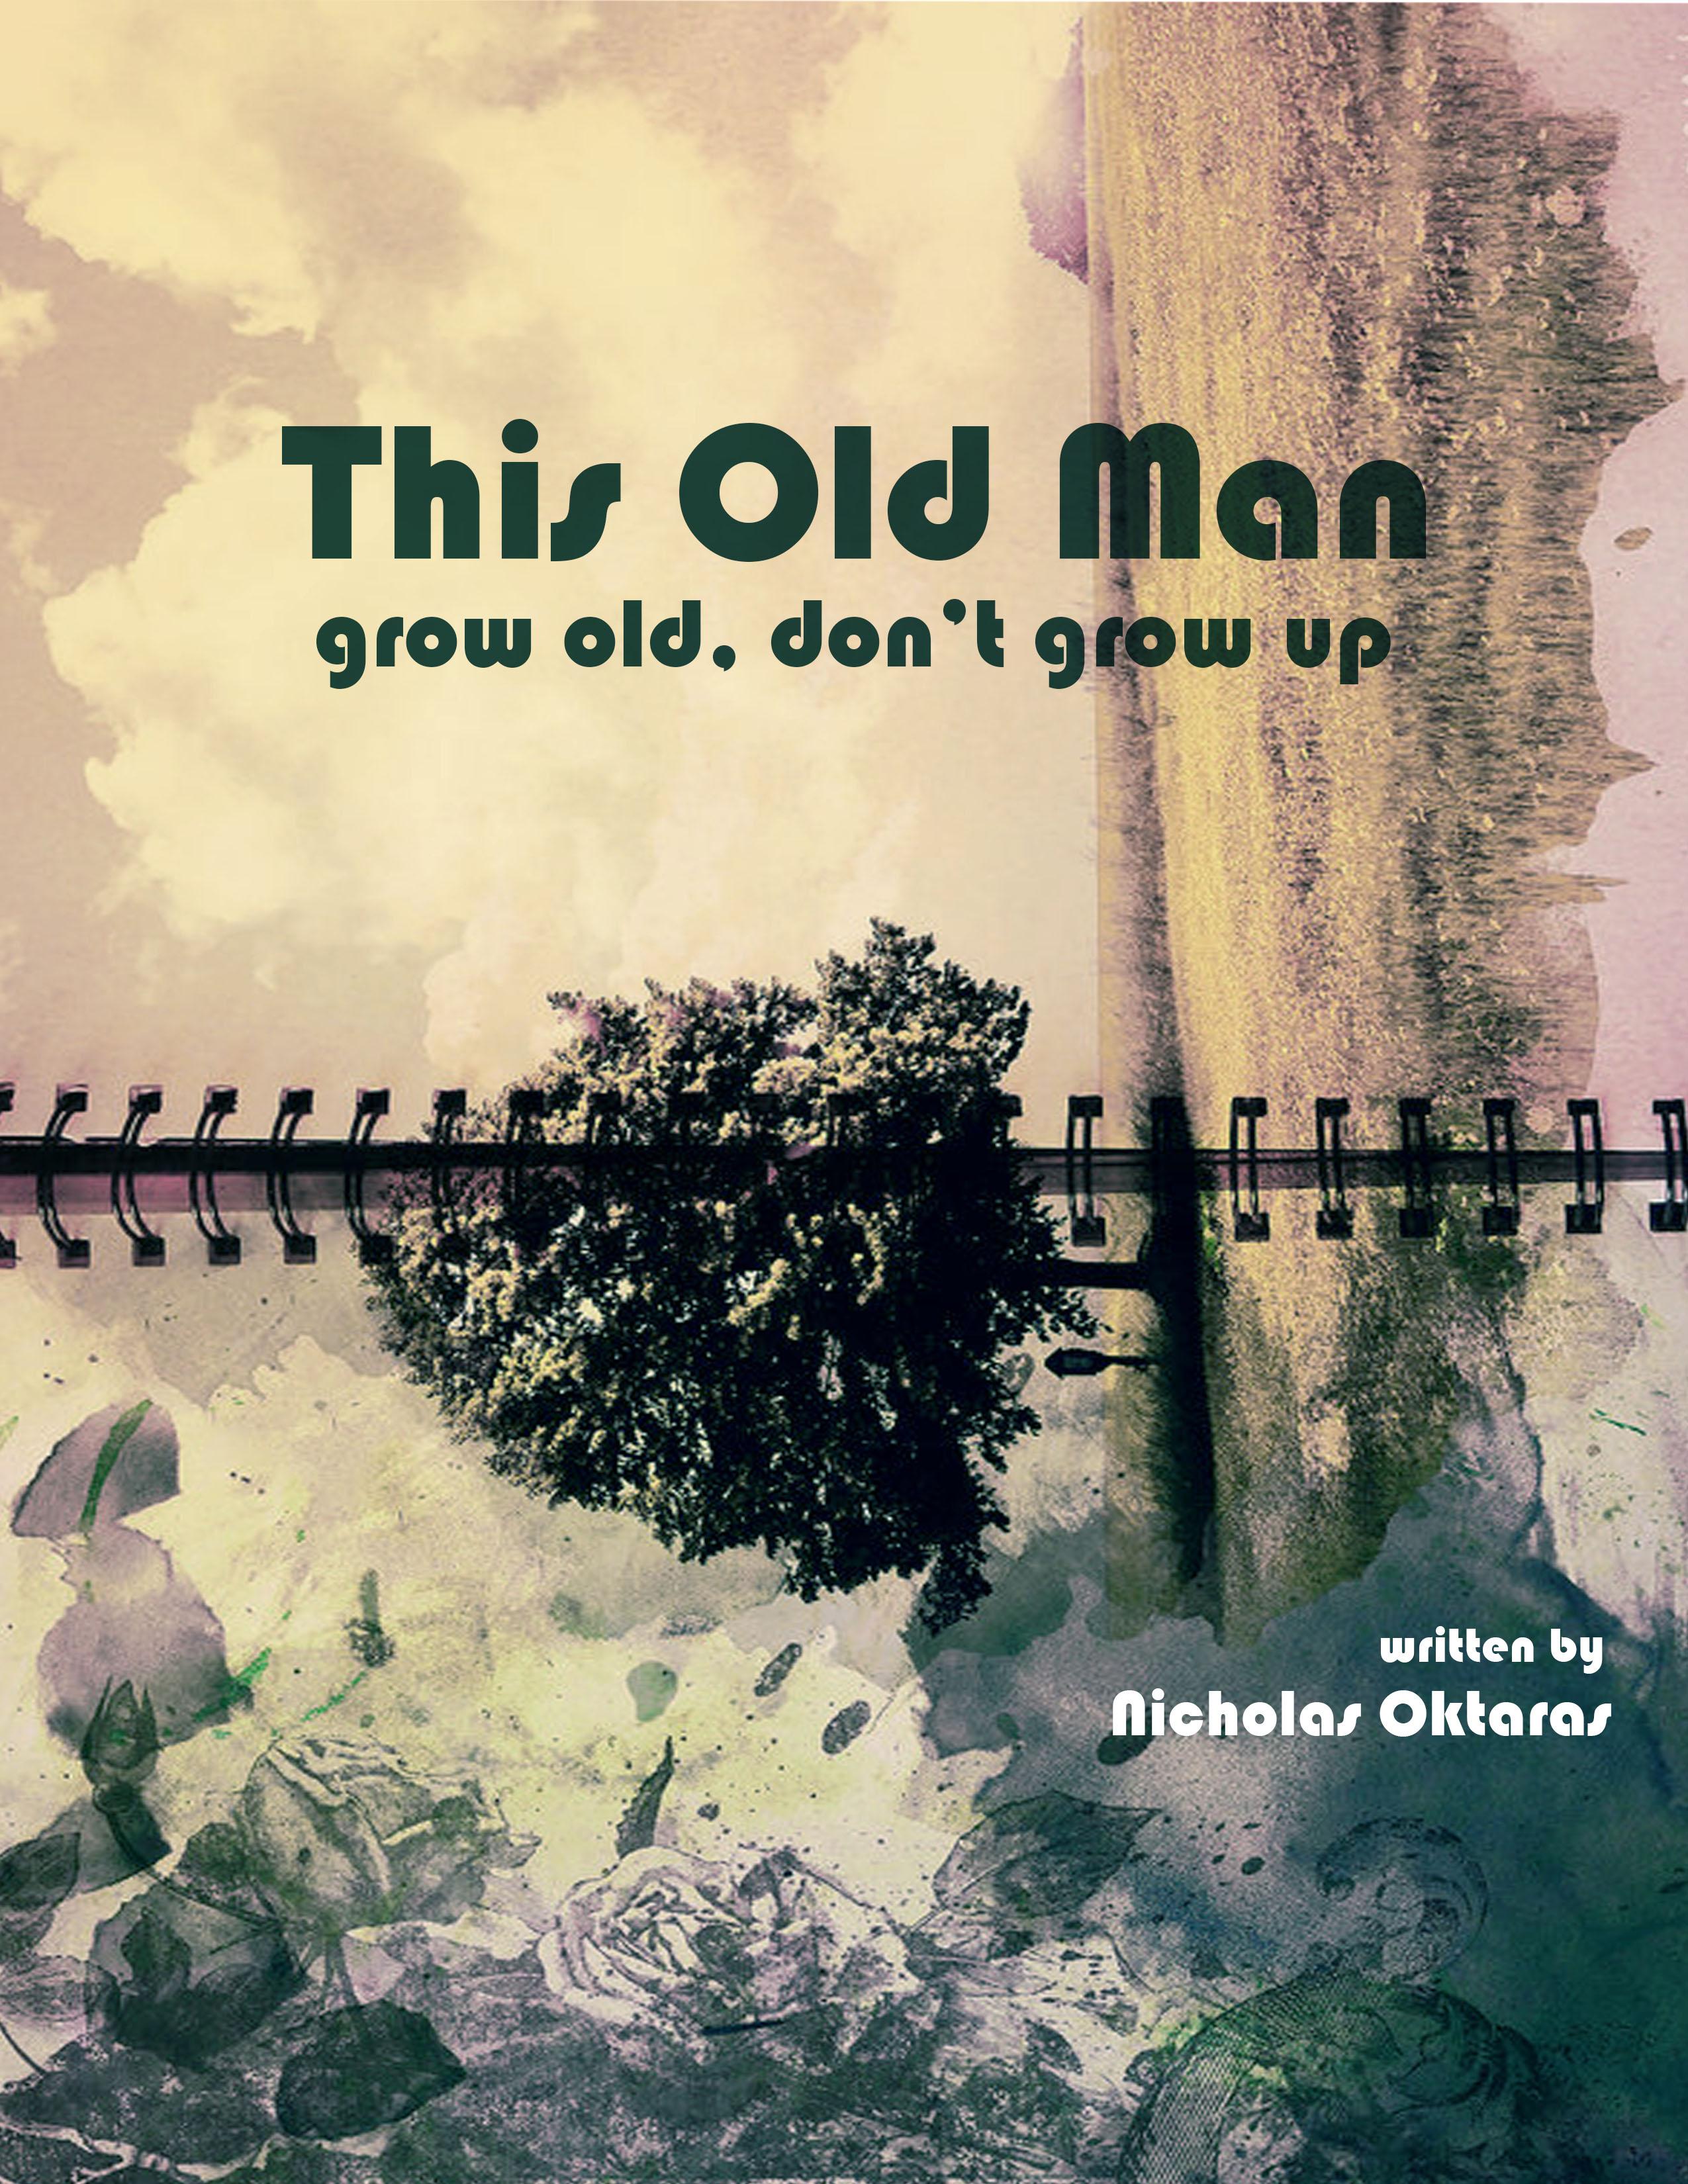 This Old Man, award winning feature film screenplay by Nicholas Oktaras